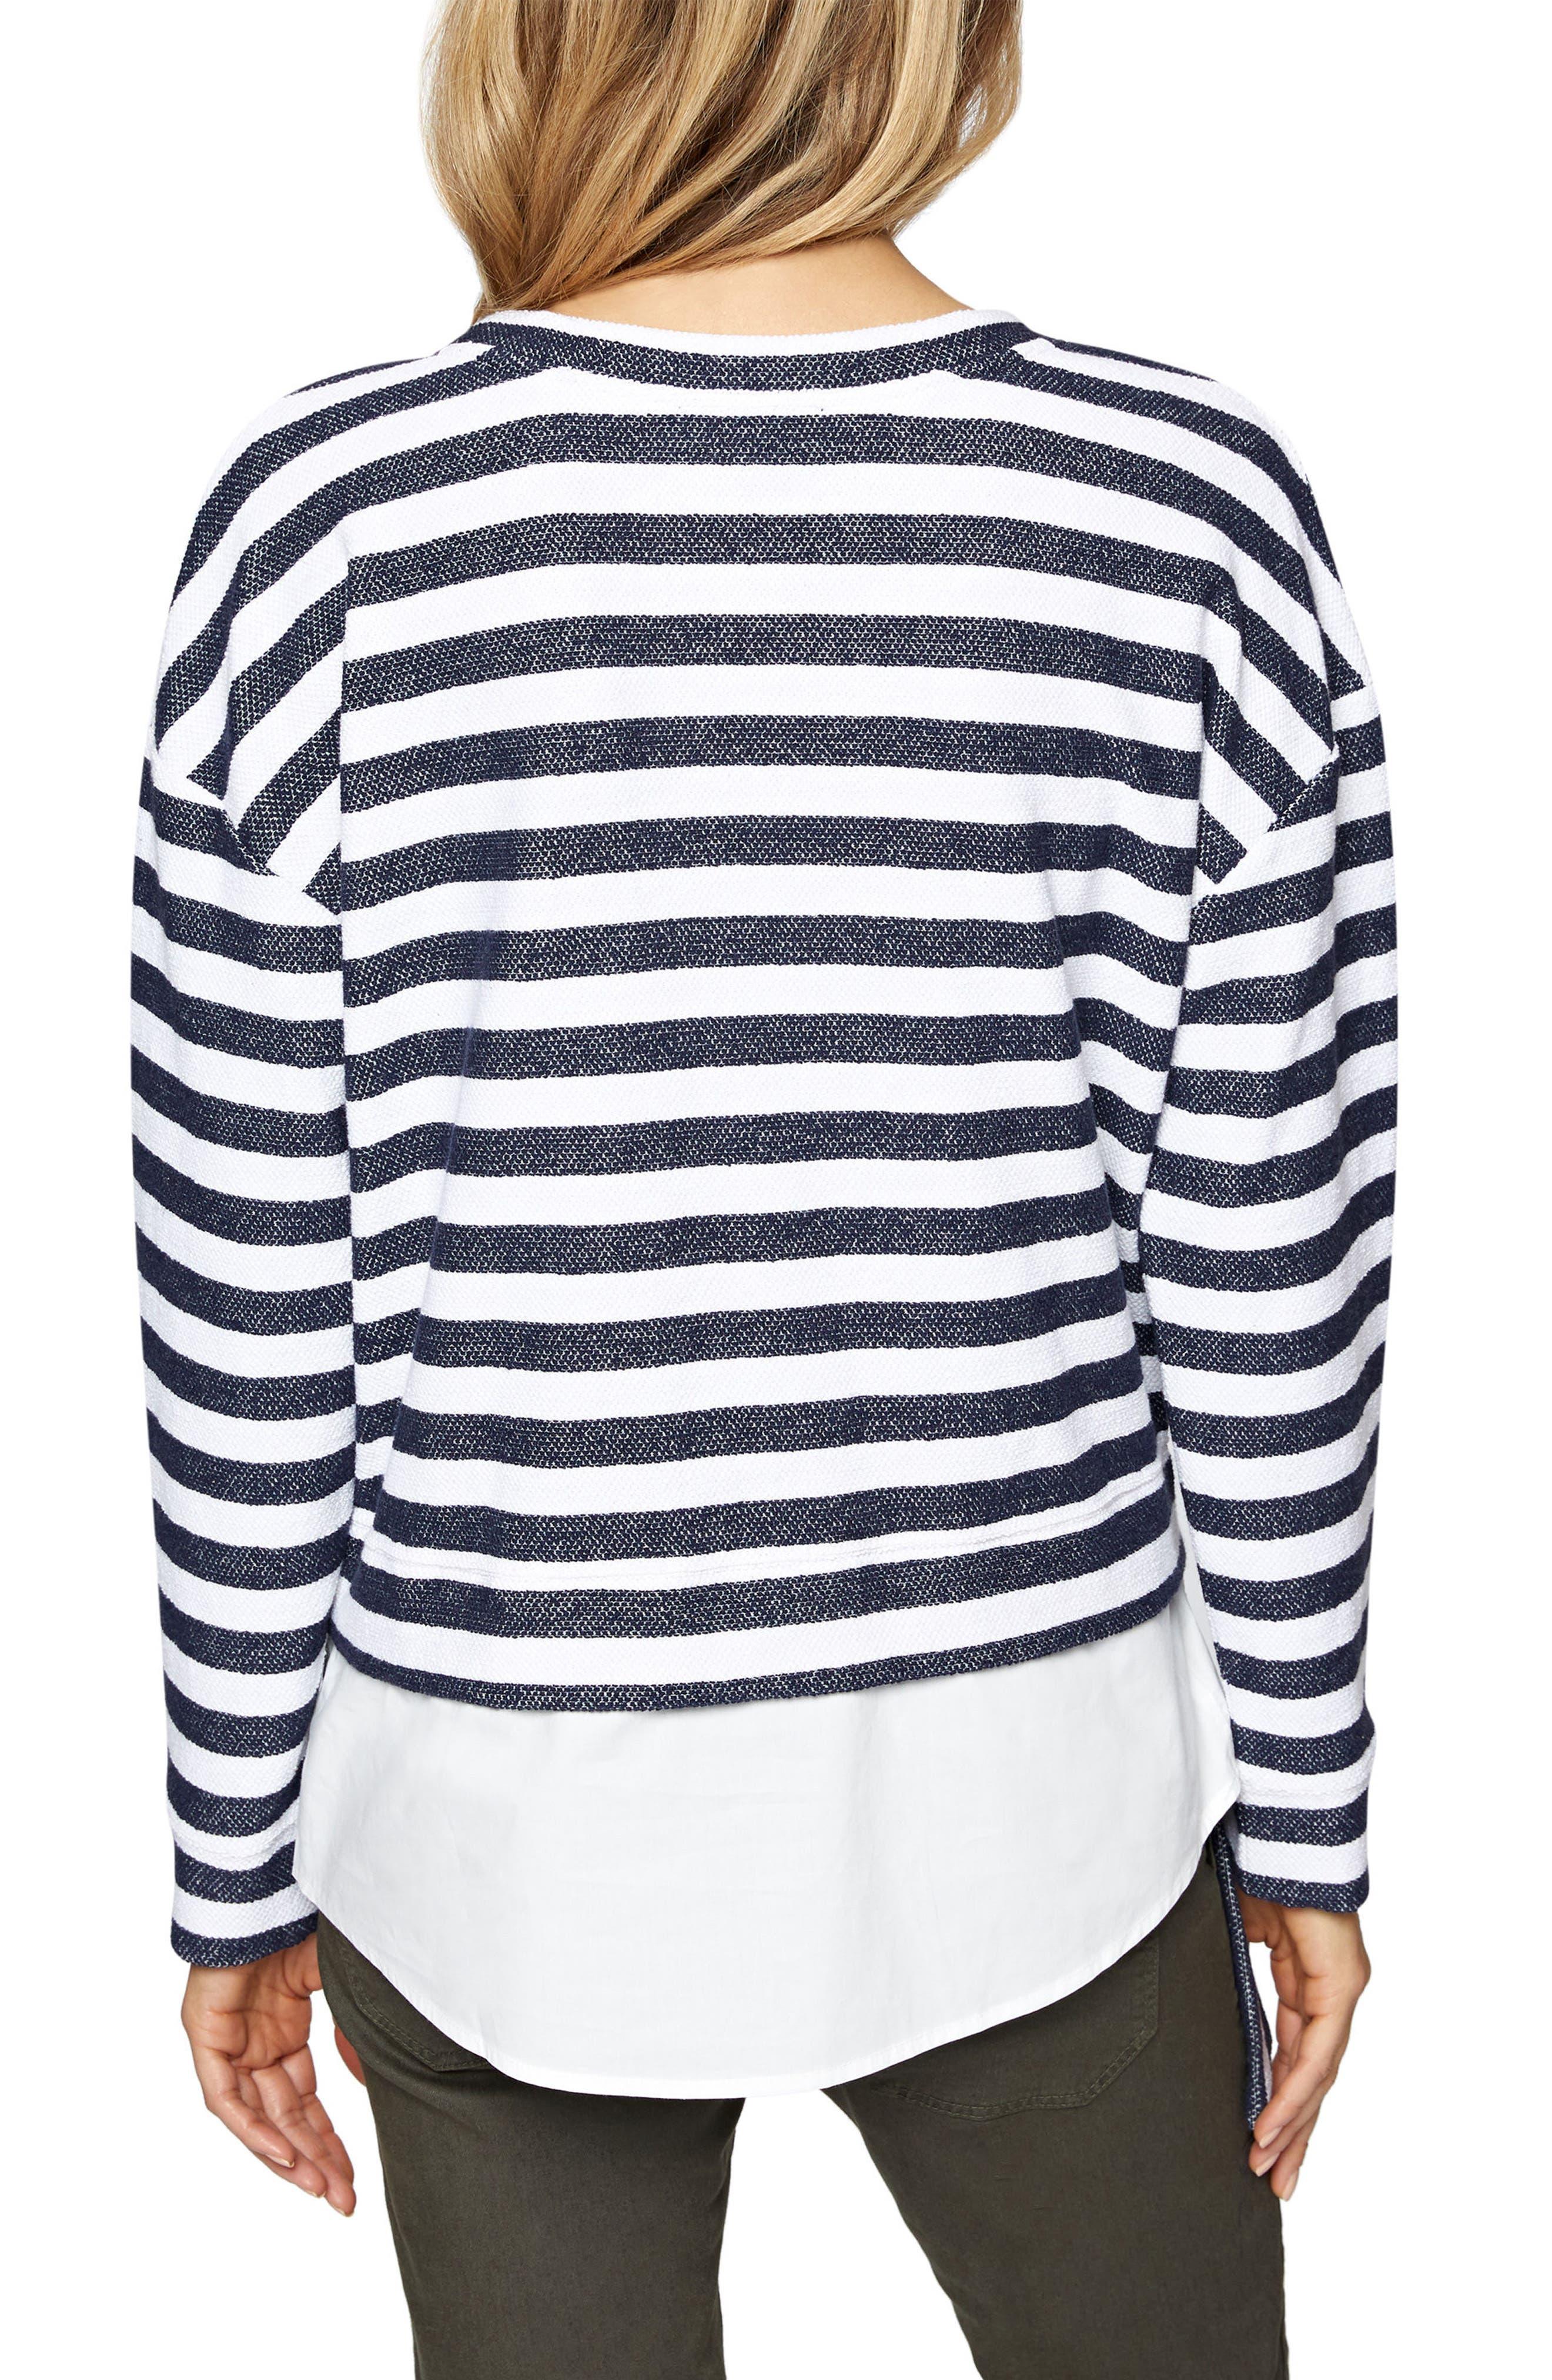 Ally Layered Look Sweatshirt,                             Alternate thumbnail 4, color,